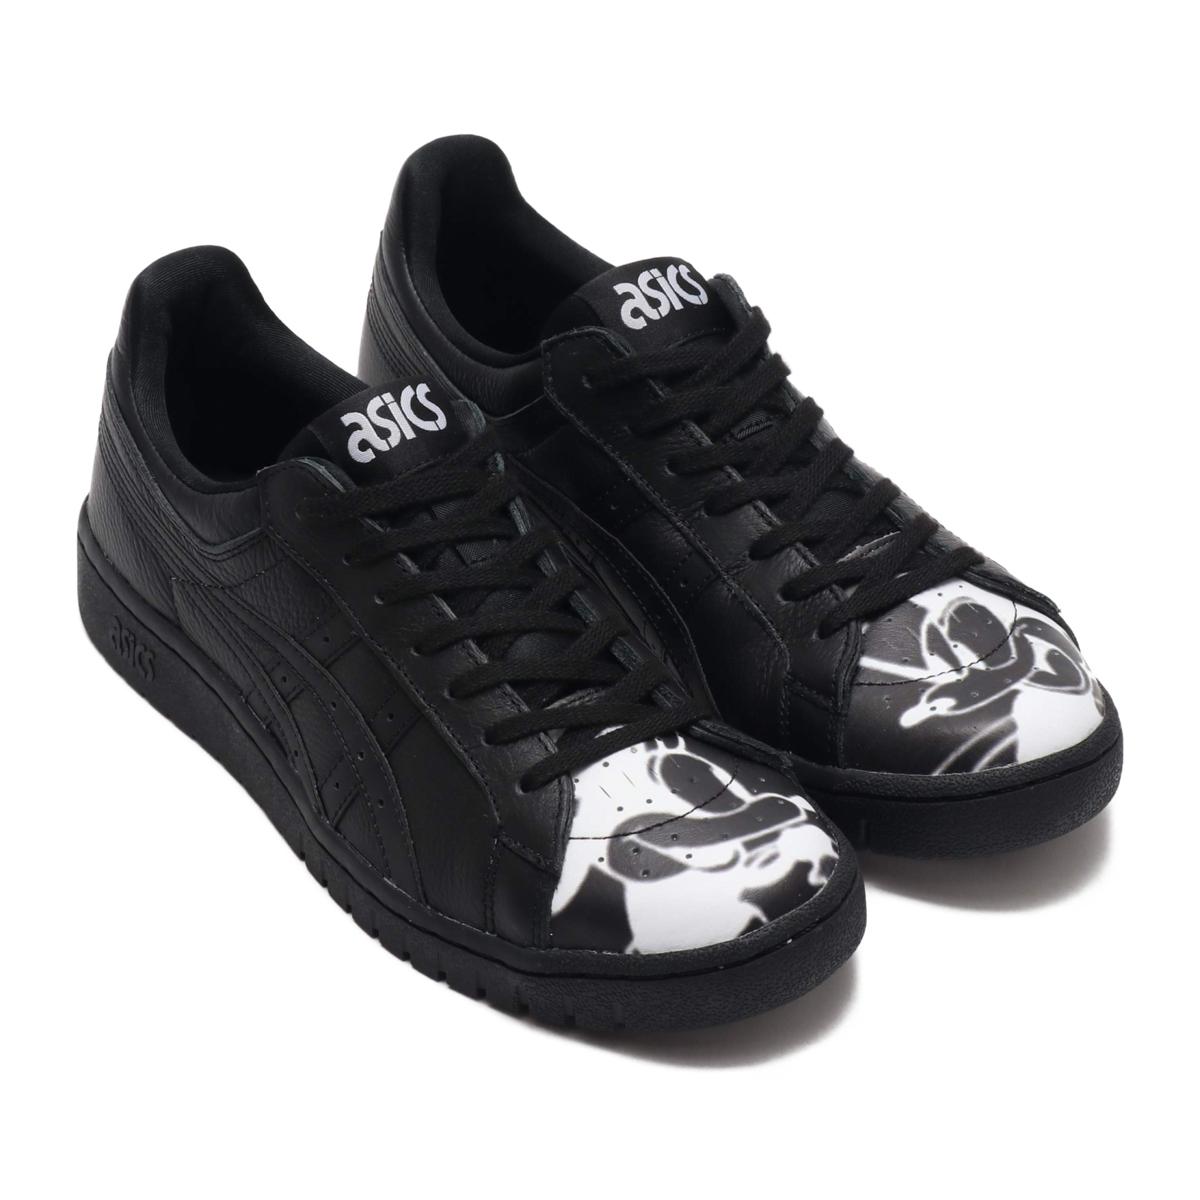 asics Tiger GEL-PTG Disney(アシックス タイガー ゲル PTG ディズニー)BLACK/BLACK【メンズ レディース スニーカー】18HO-S